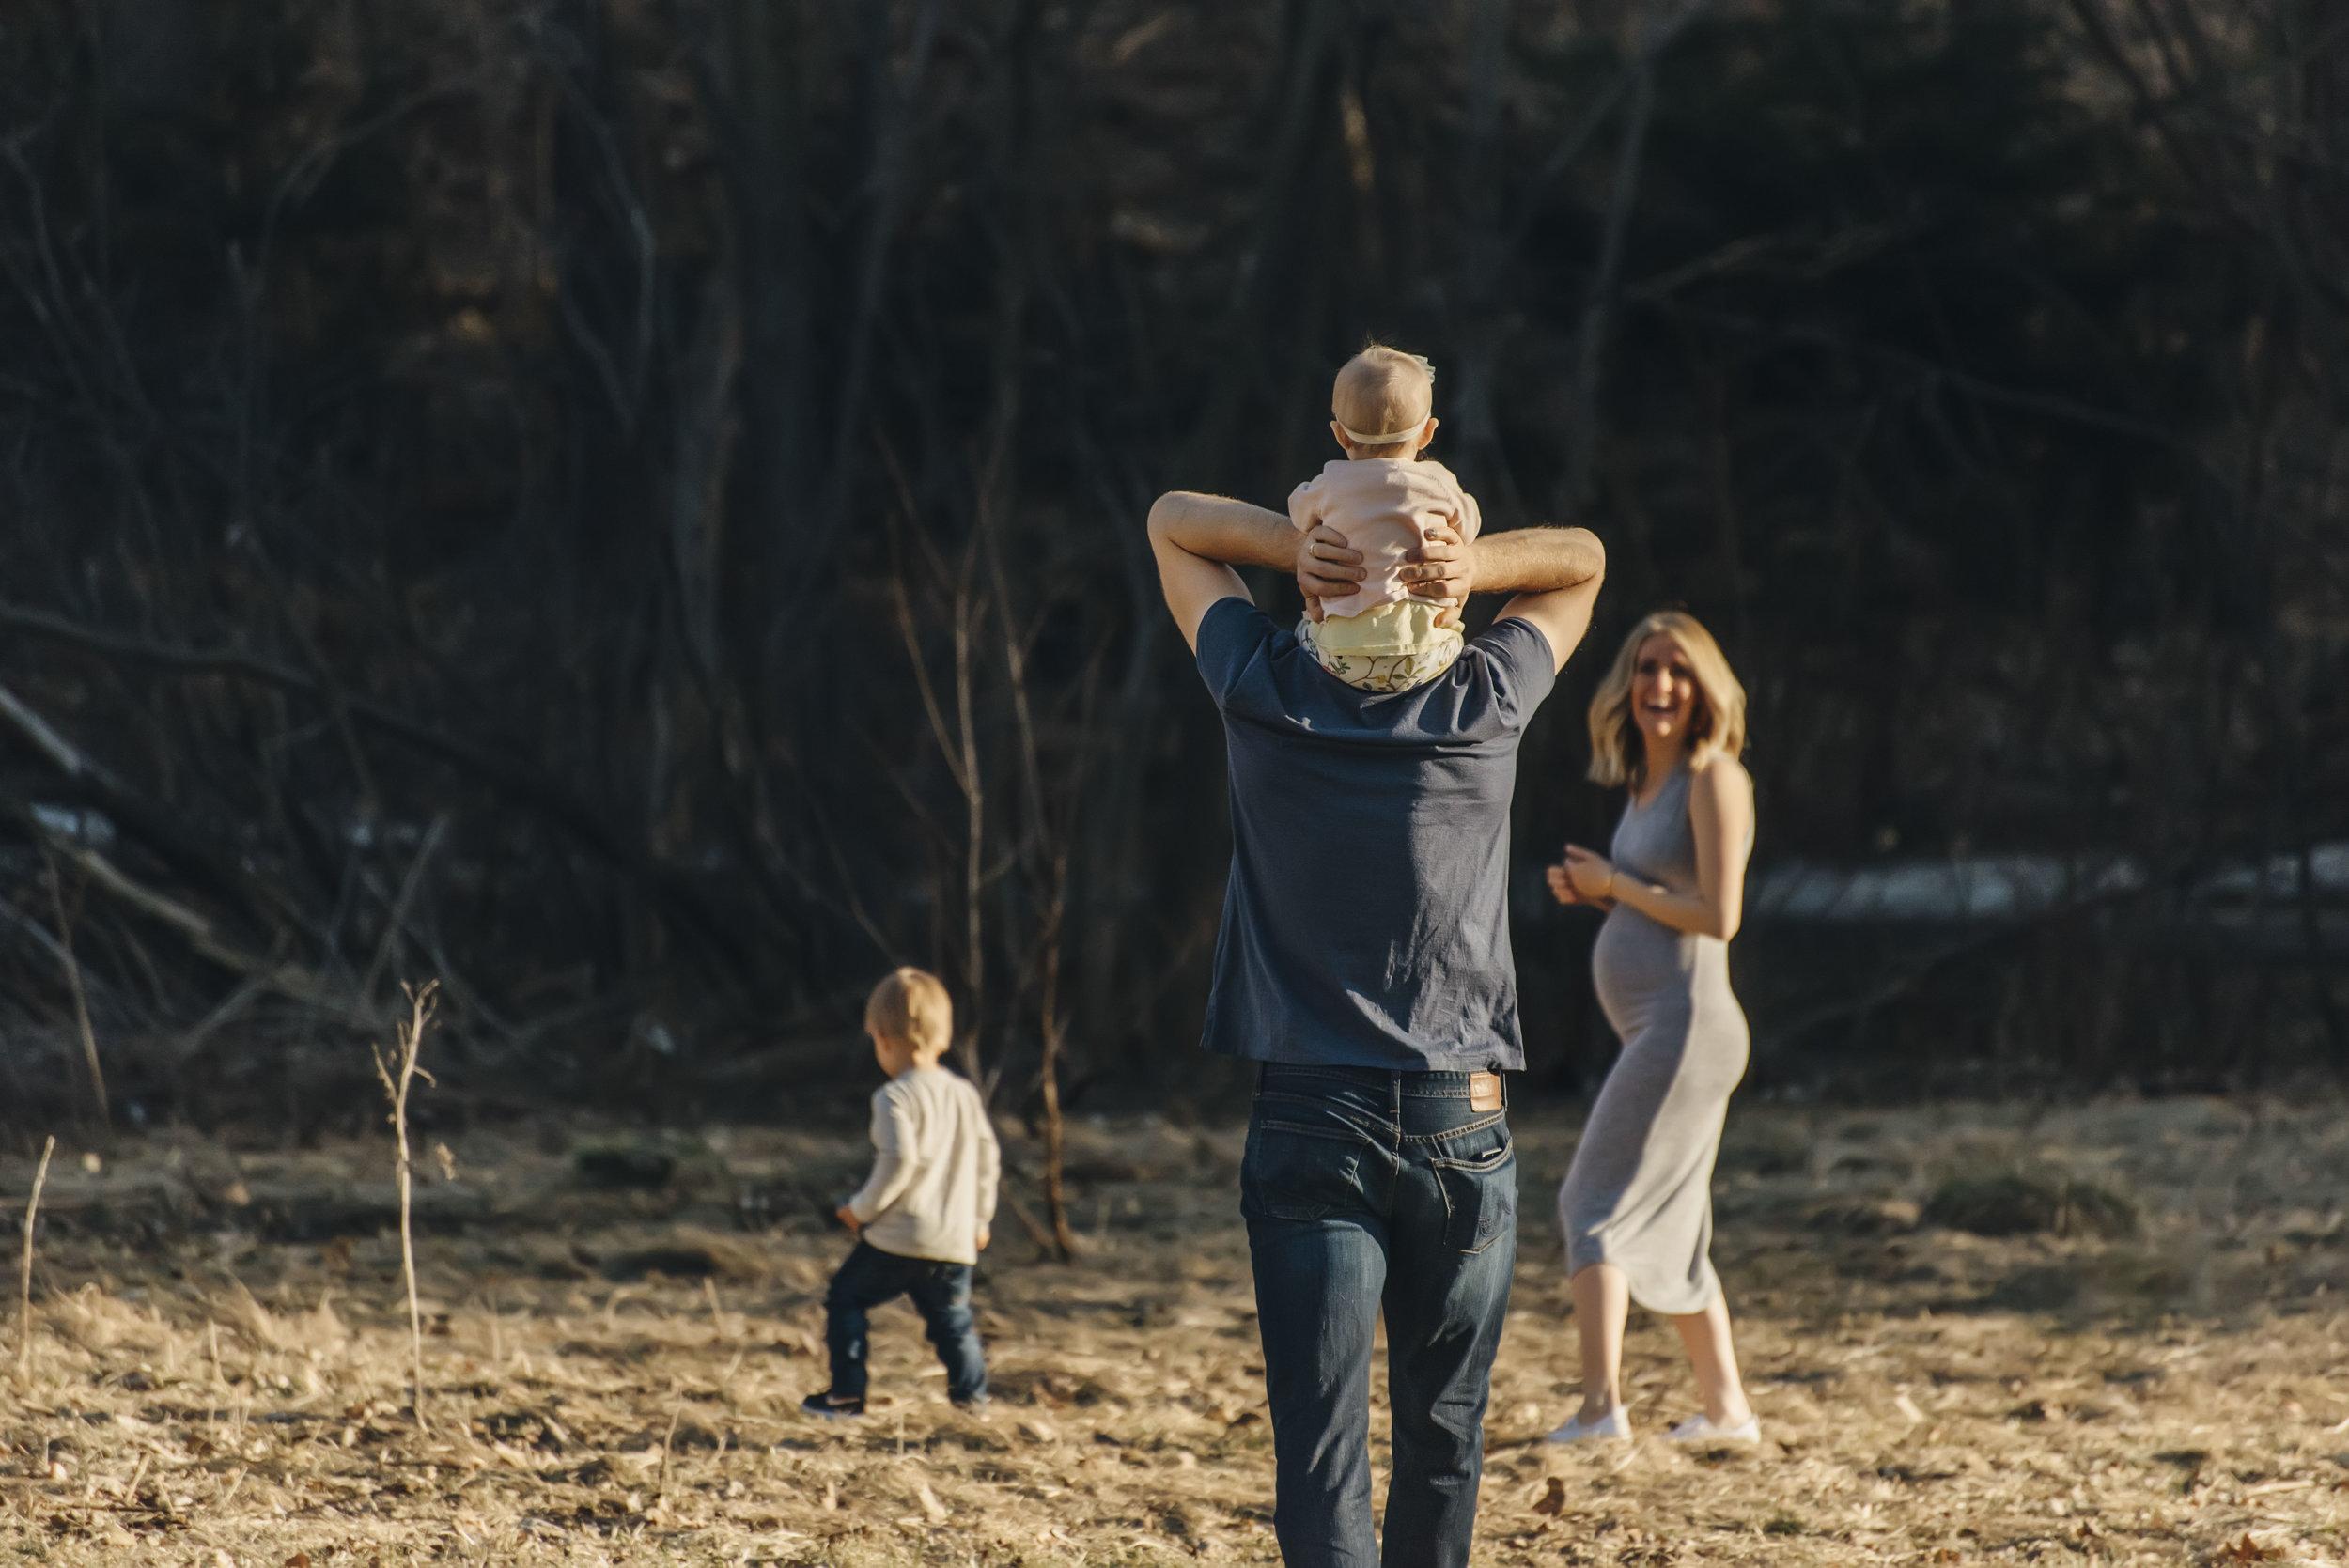 The Turris Family Then There Were 5 Ottawa Family Photographer